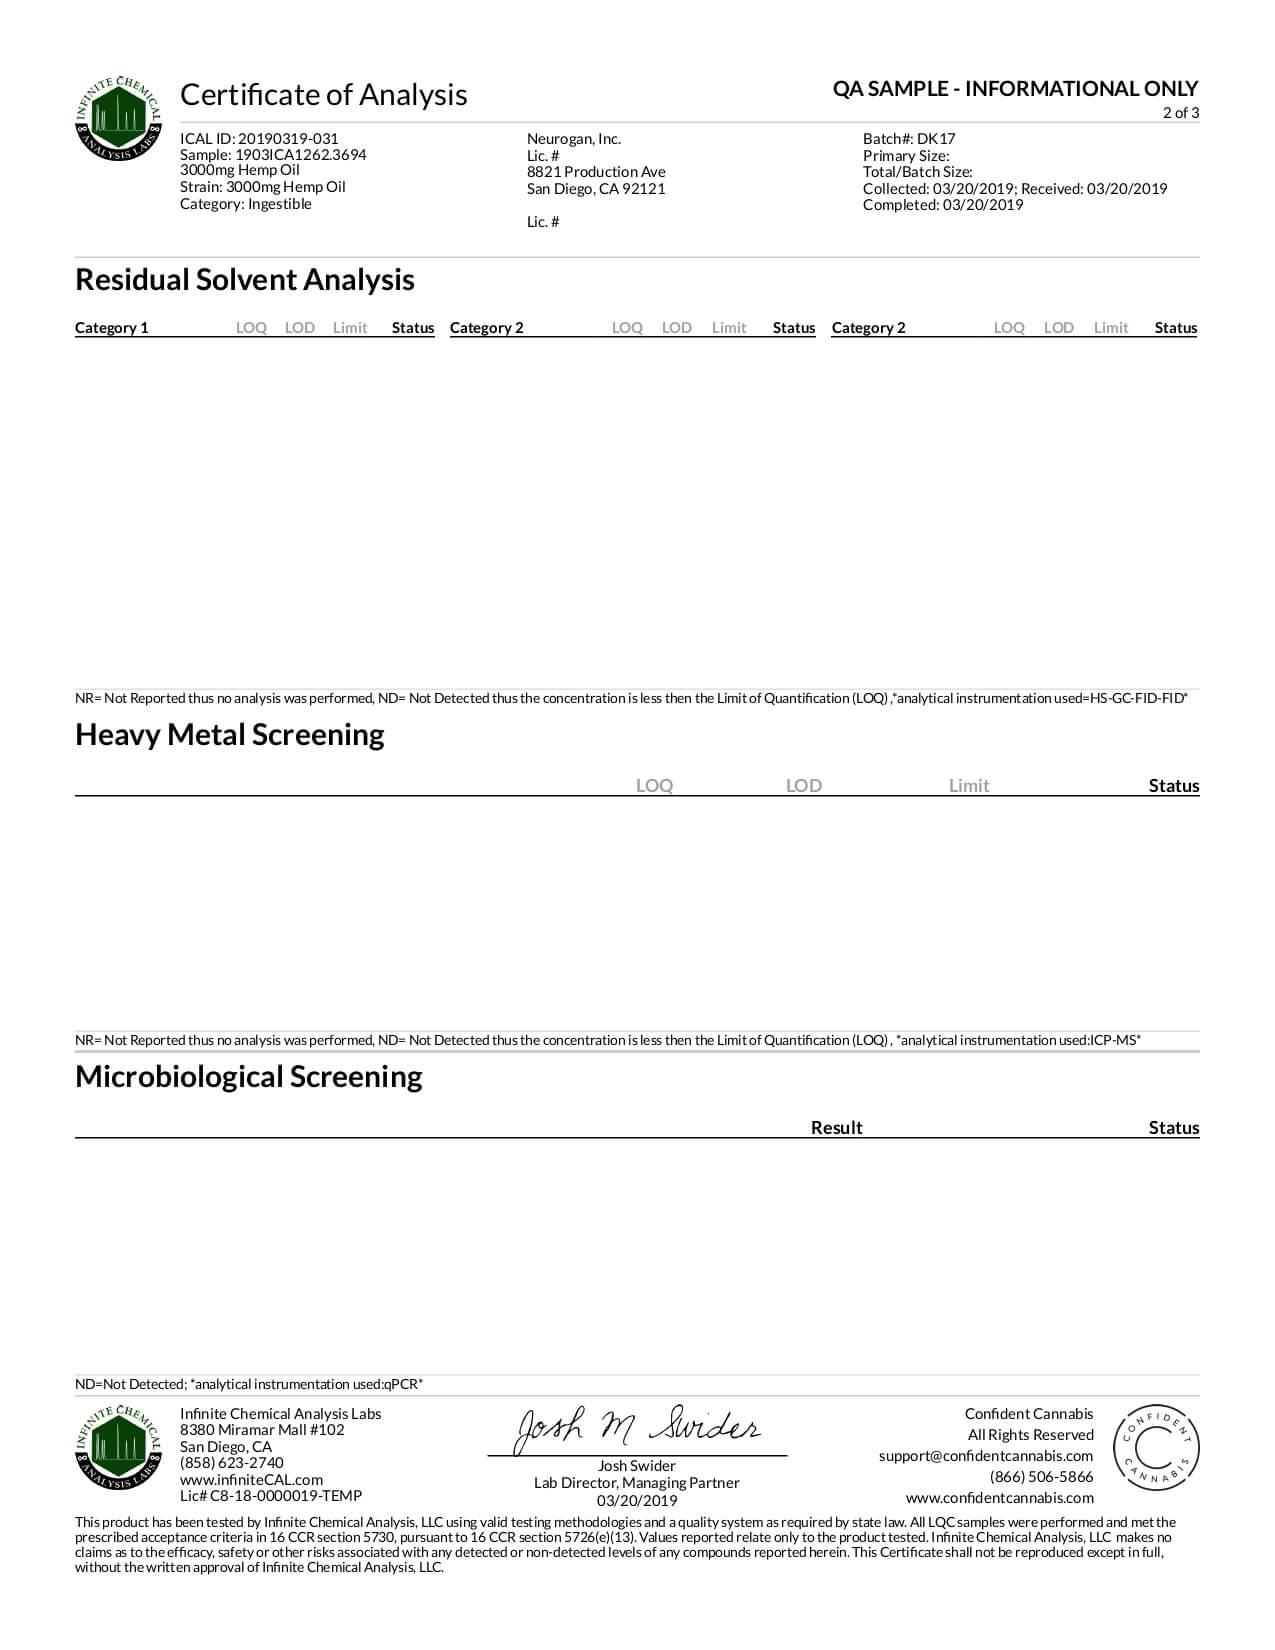 Neurogan, Inc. CBD Oil Spray Full Spectrum Citrus 3000mg Lab Report